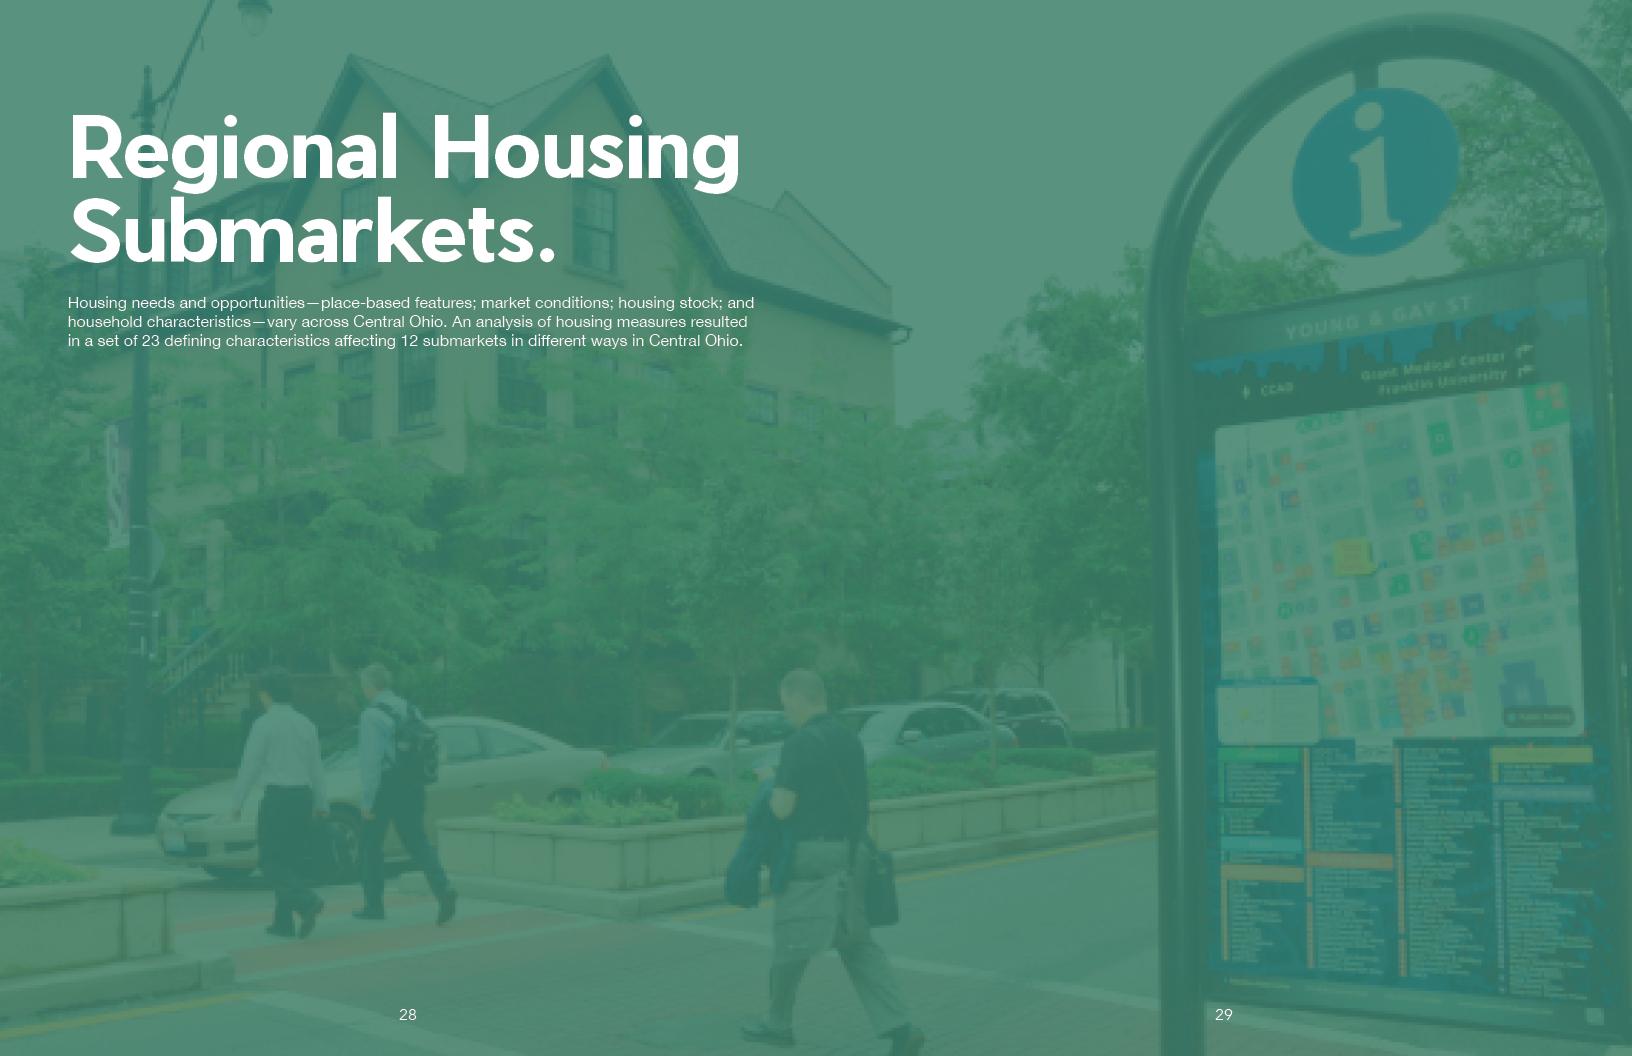 Regional Housing Submarkets